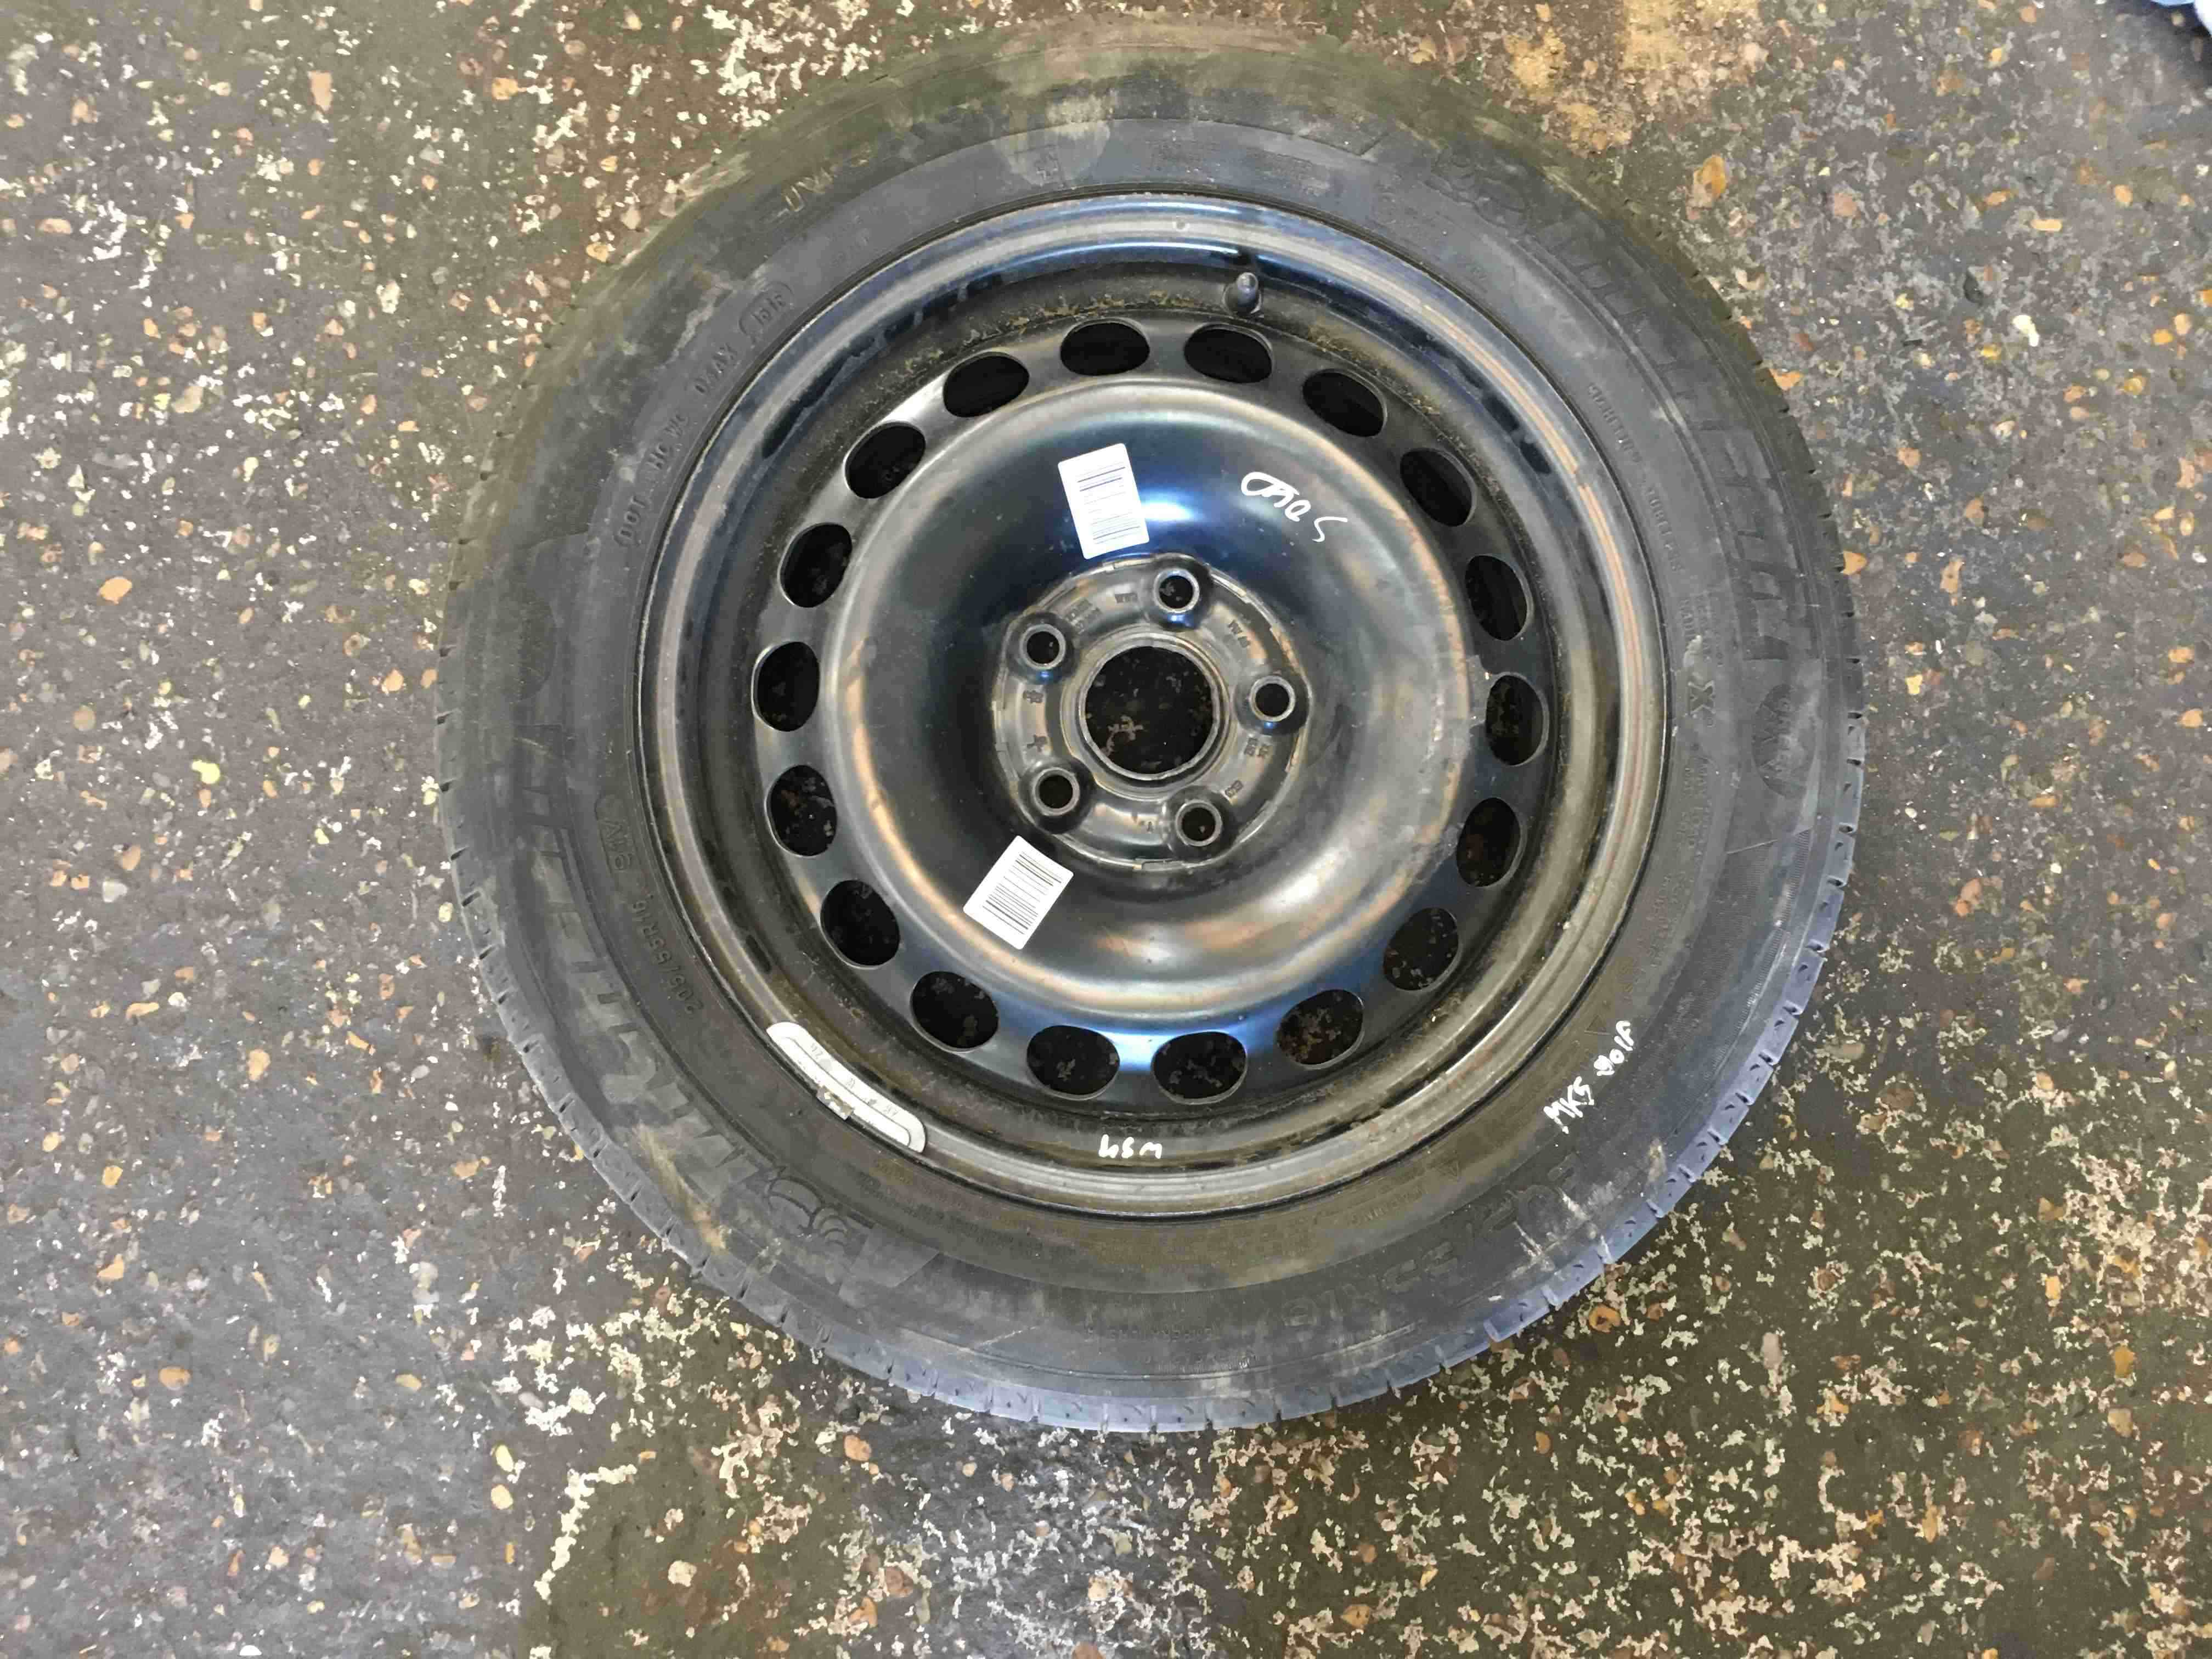 Volkswagen Golf MK5 2003-2009 Steel Wheel Rim Spare + Tyre 205 65 15  5mm 3/5